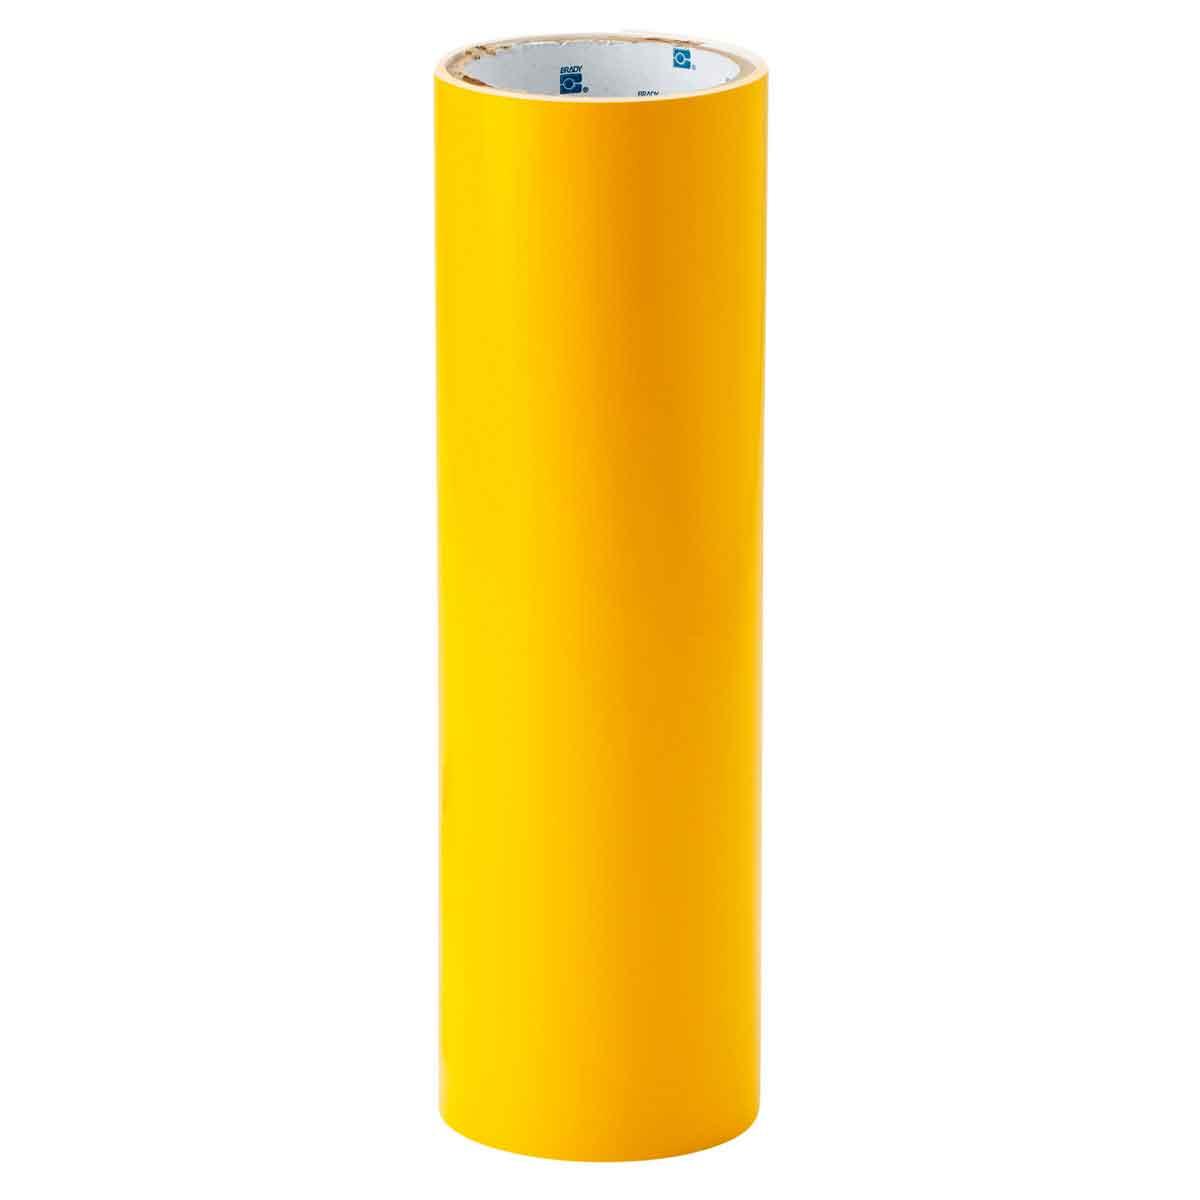 Brady® 121119 Non-Reflective Shadow Board Tool Tape, 12 ft L x 12 in W, Yellow, B-7569 Vinyl Film